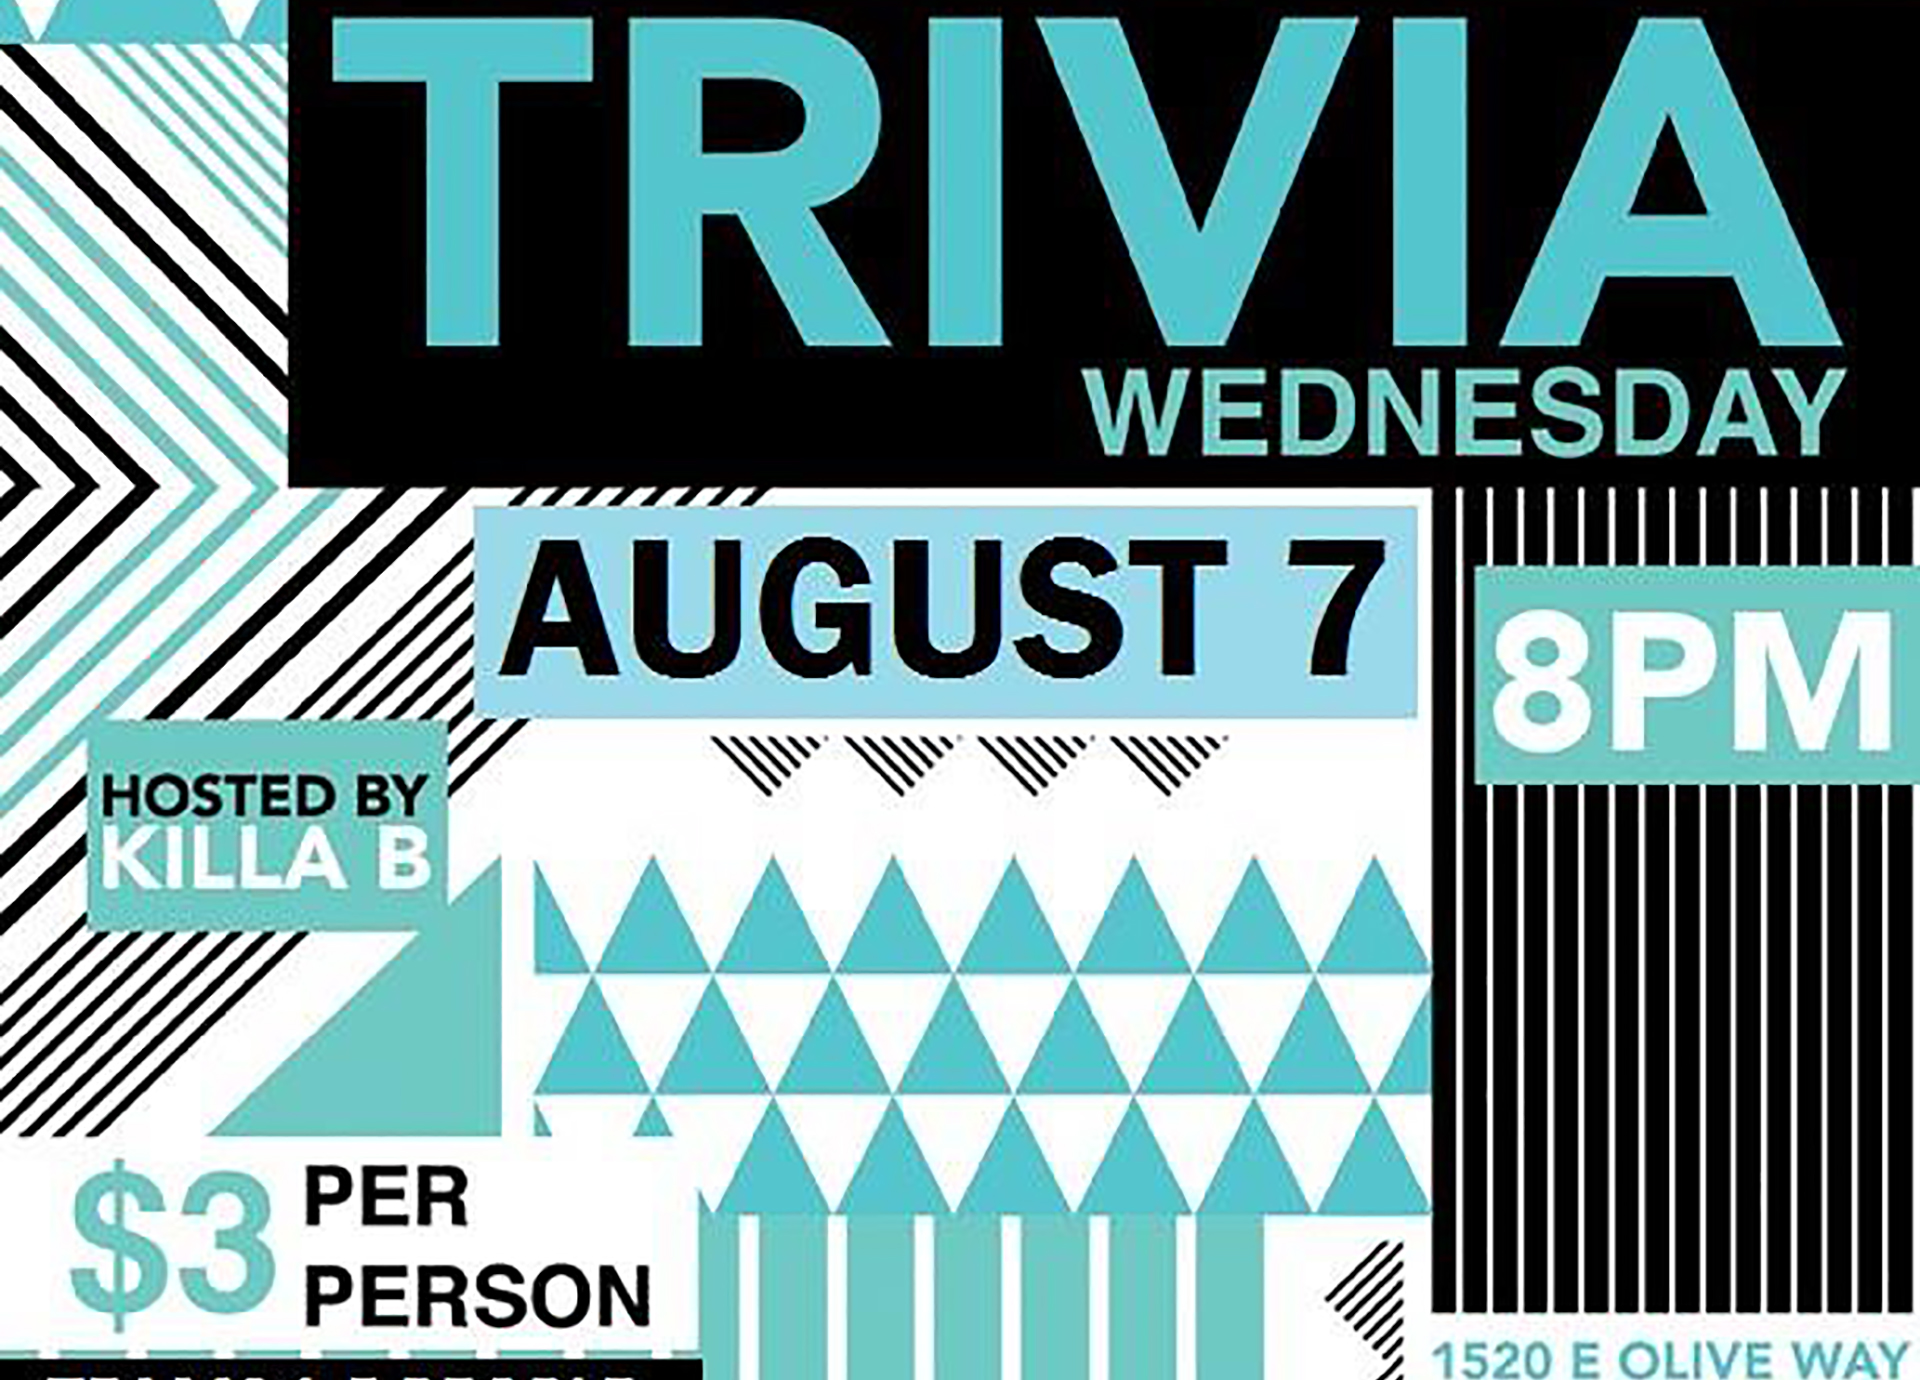 Hillside August Trivia